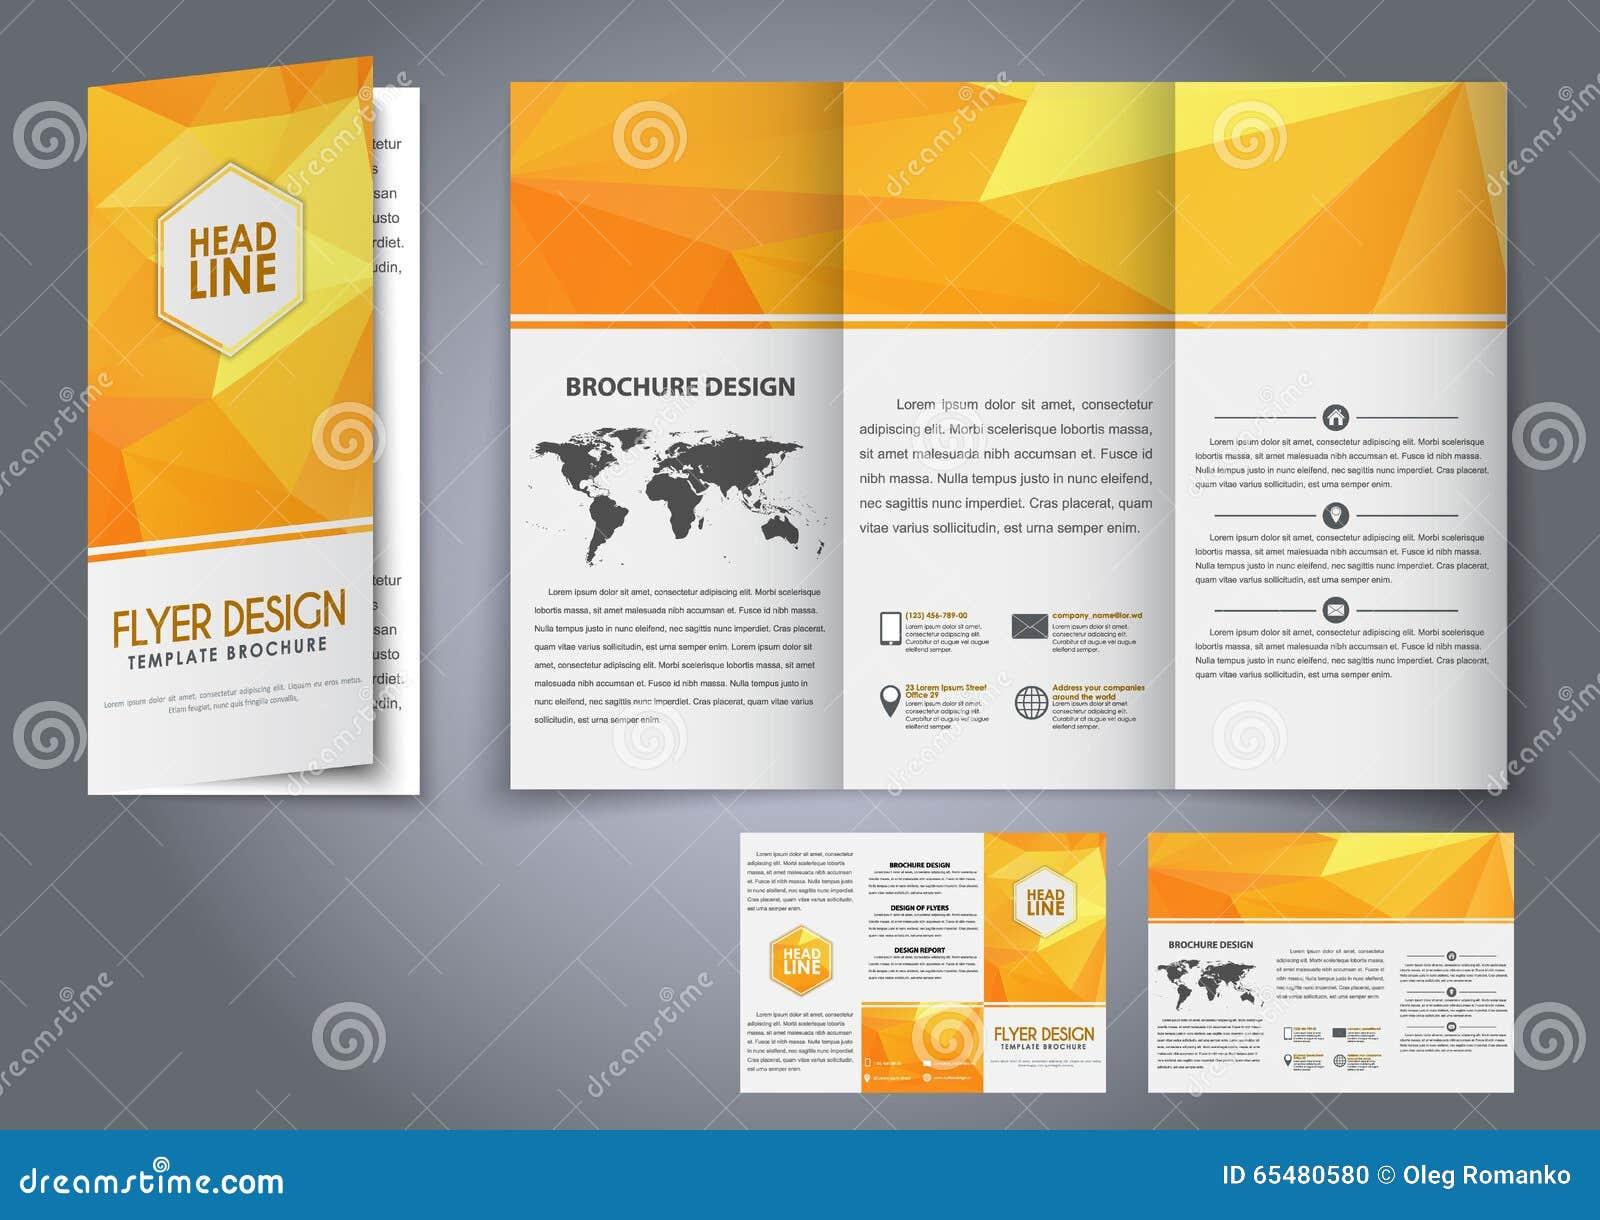 template design three fold flyer brochure stock vector image 65480580. Black Bedroom Furniture Sets. Home Design Ideas